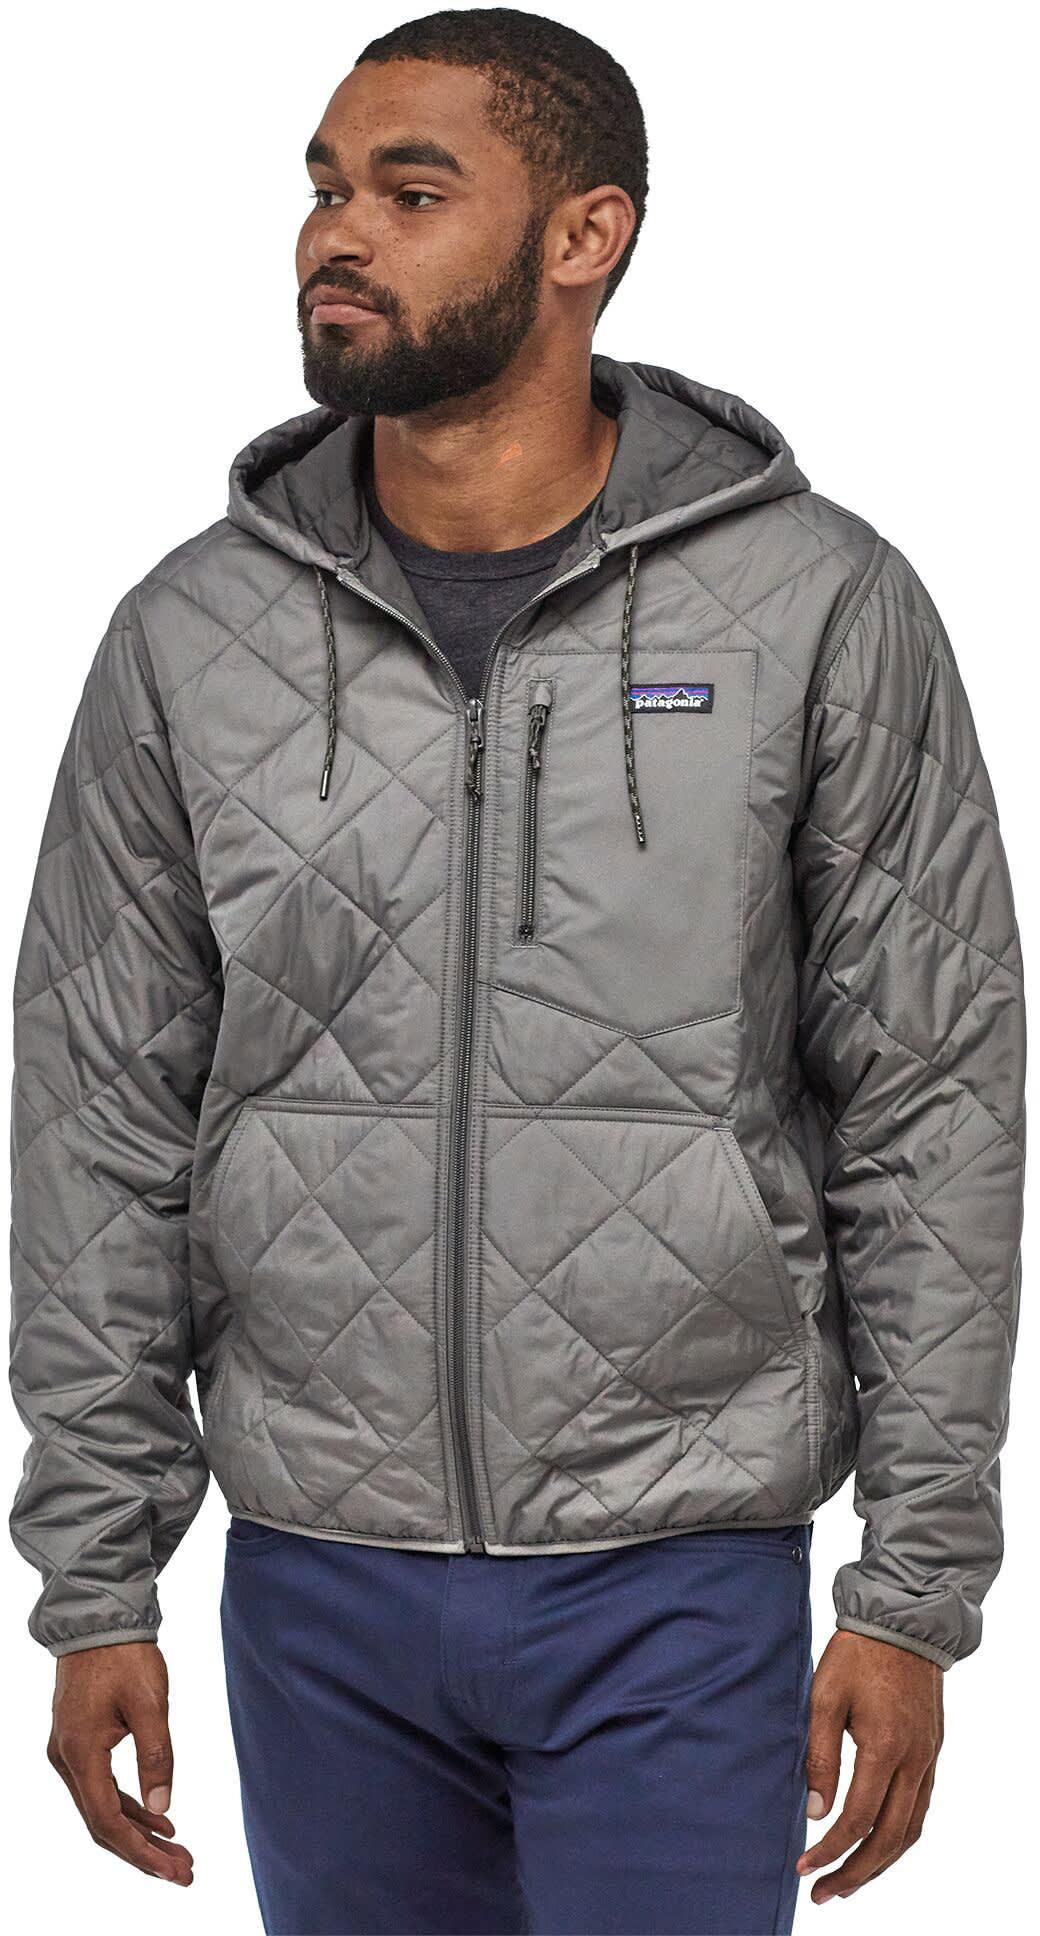 Patagonia Diamond Quilt Bomber Hoodie Jacket